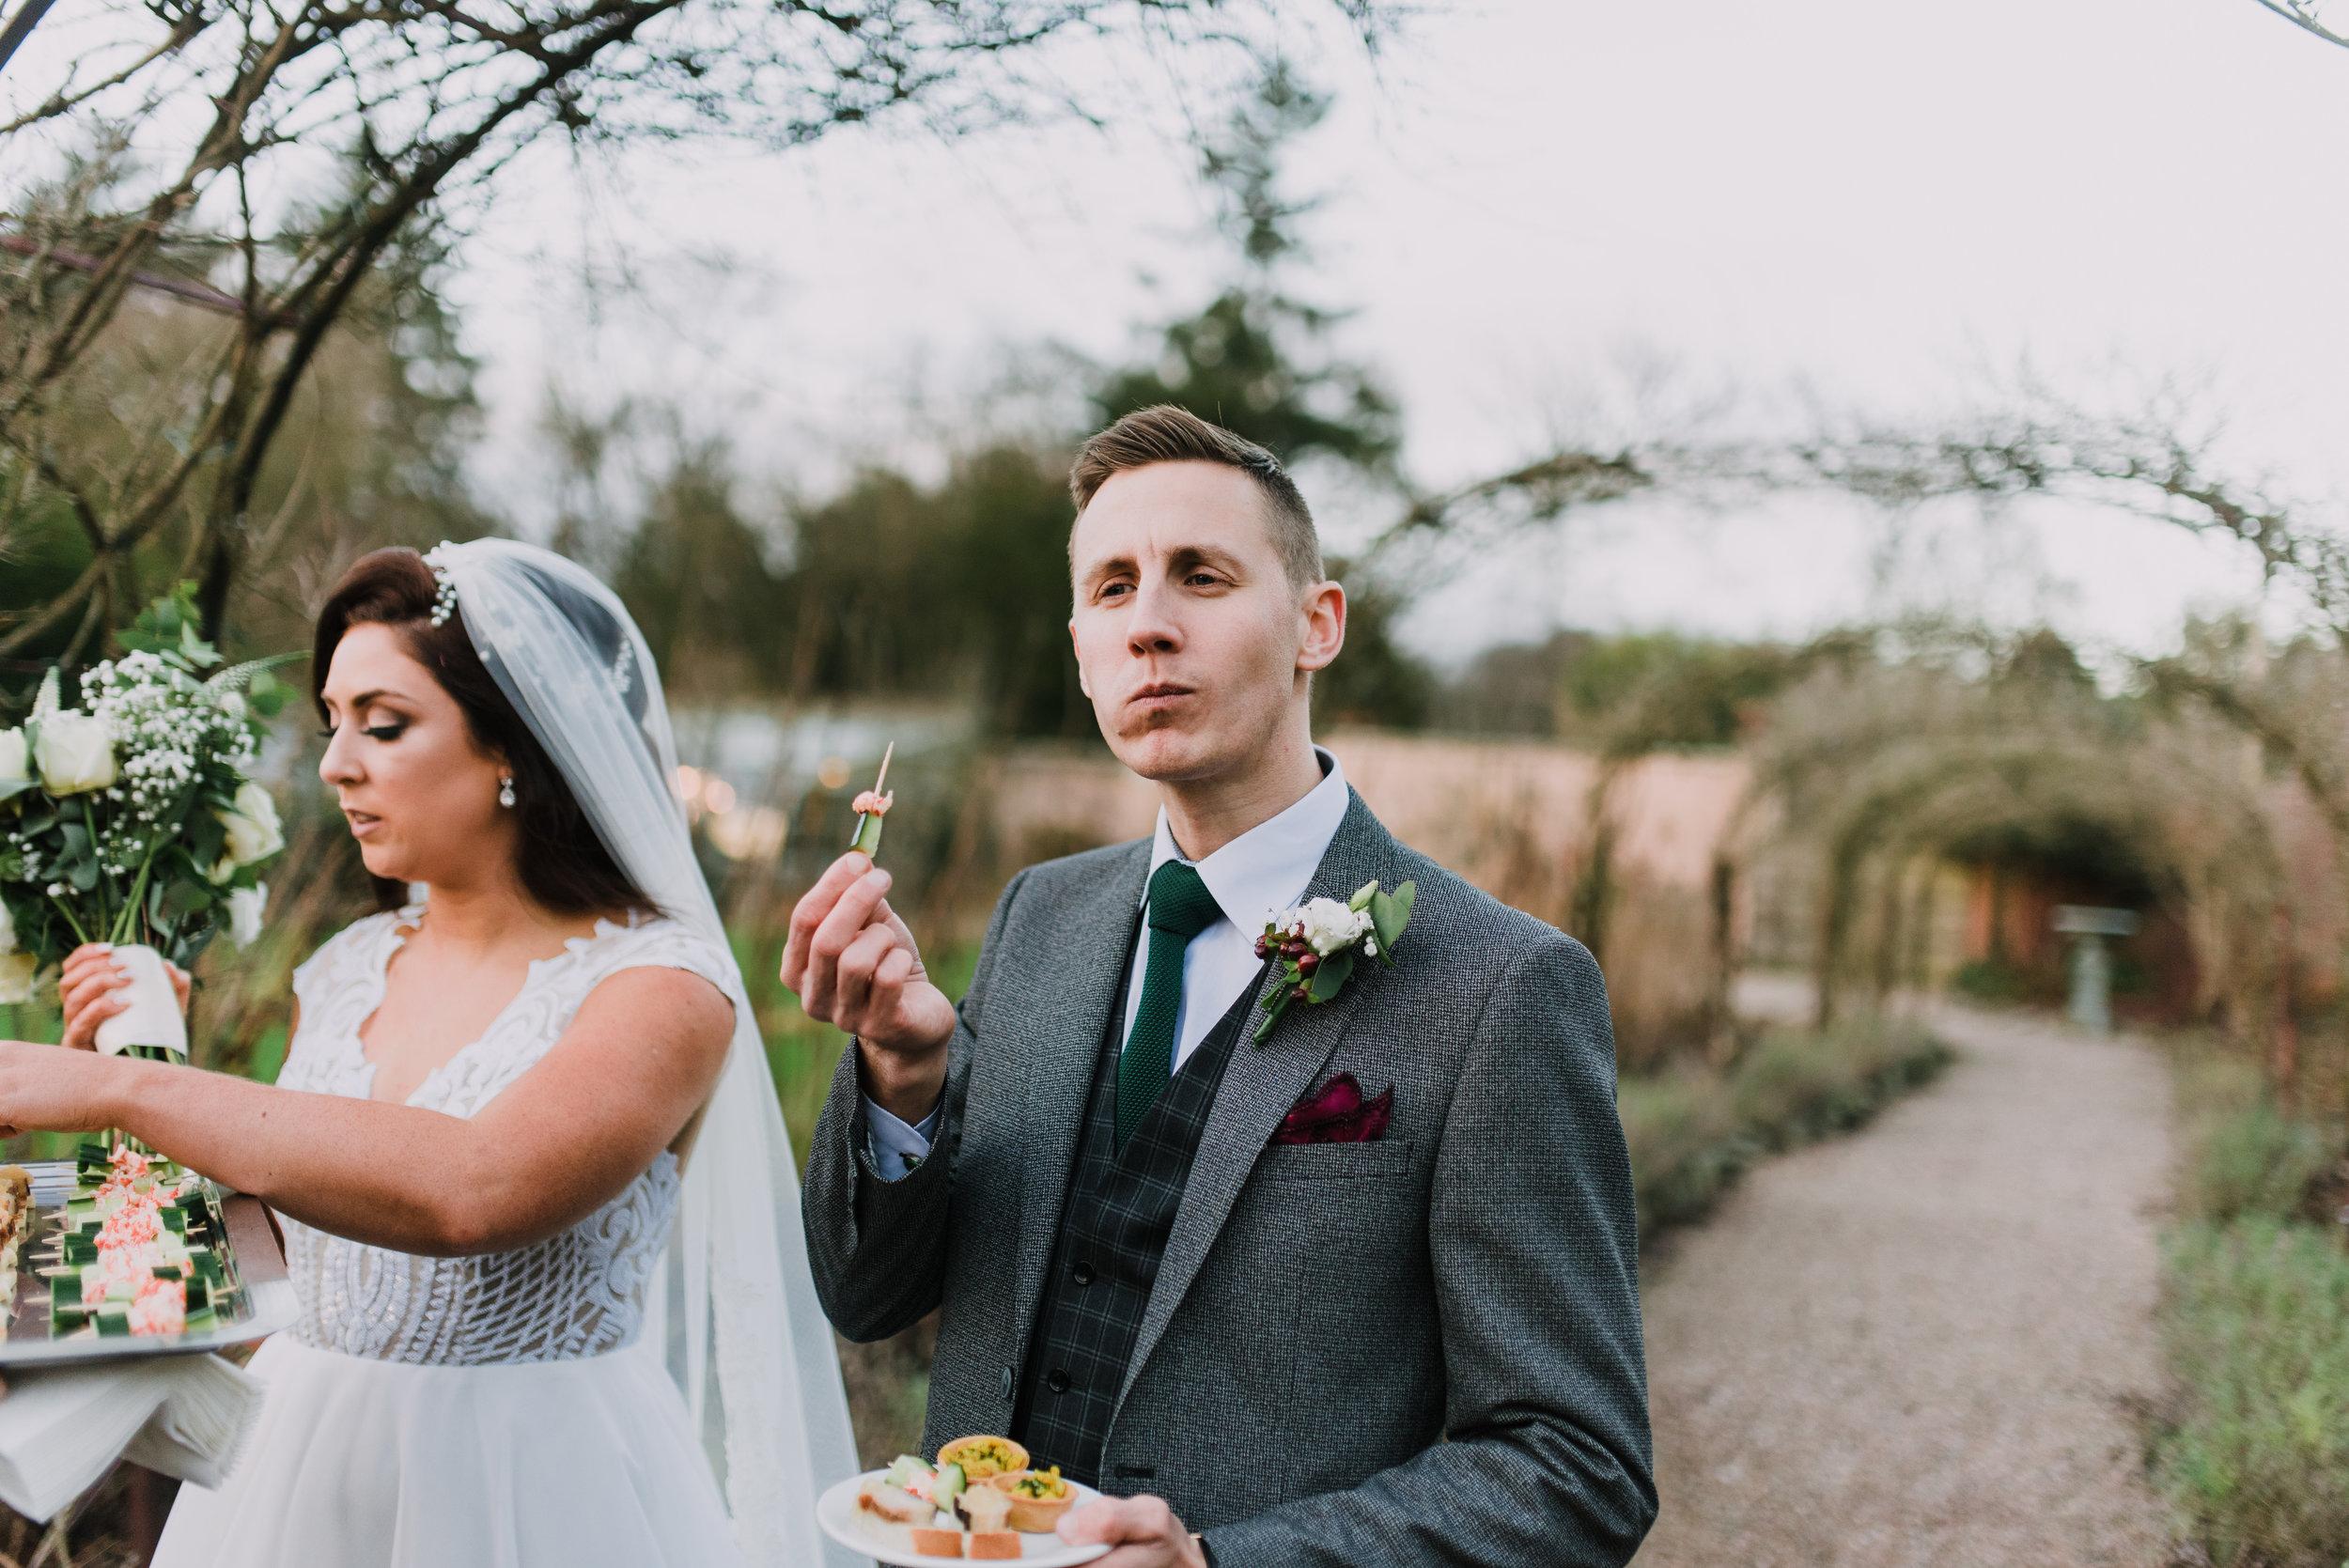 larchfield estate wedding, wedding venues northern ireland, barn wedding venues northern ireland, quirky weddings ni, wedding photos larchfield estate, shane todd's wedding (6).jpg